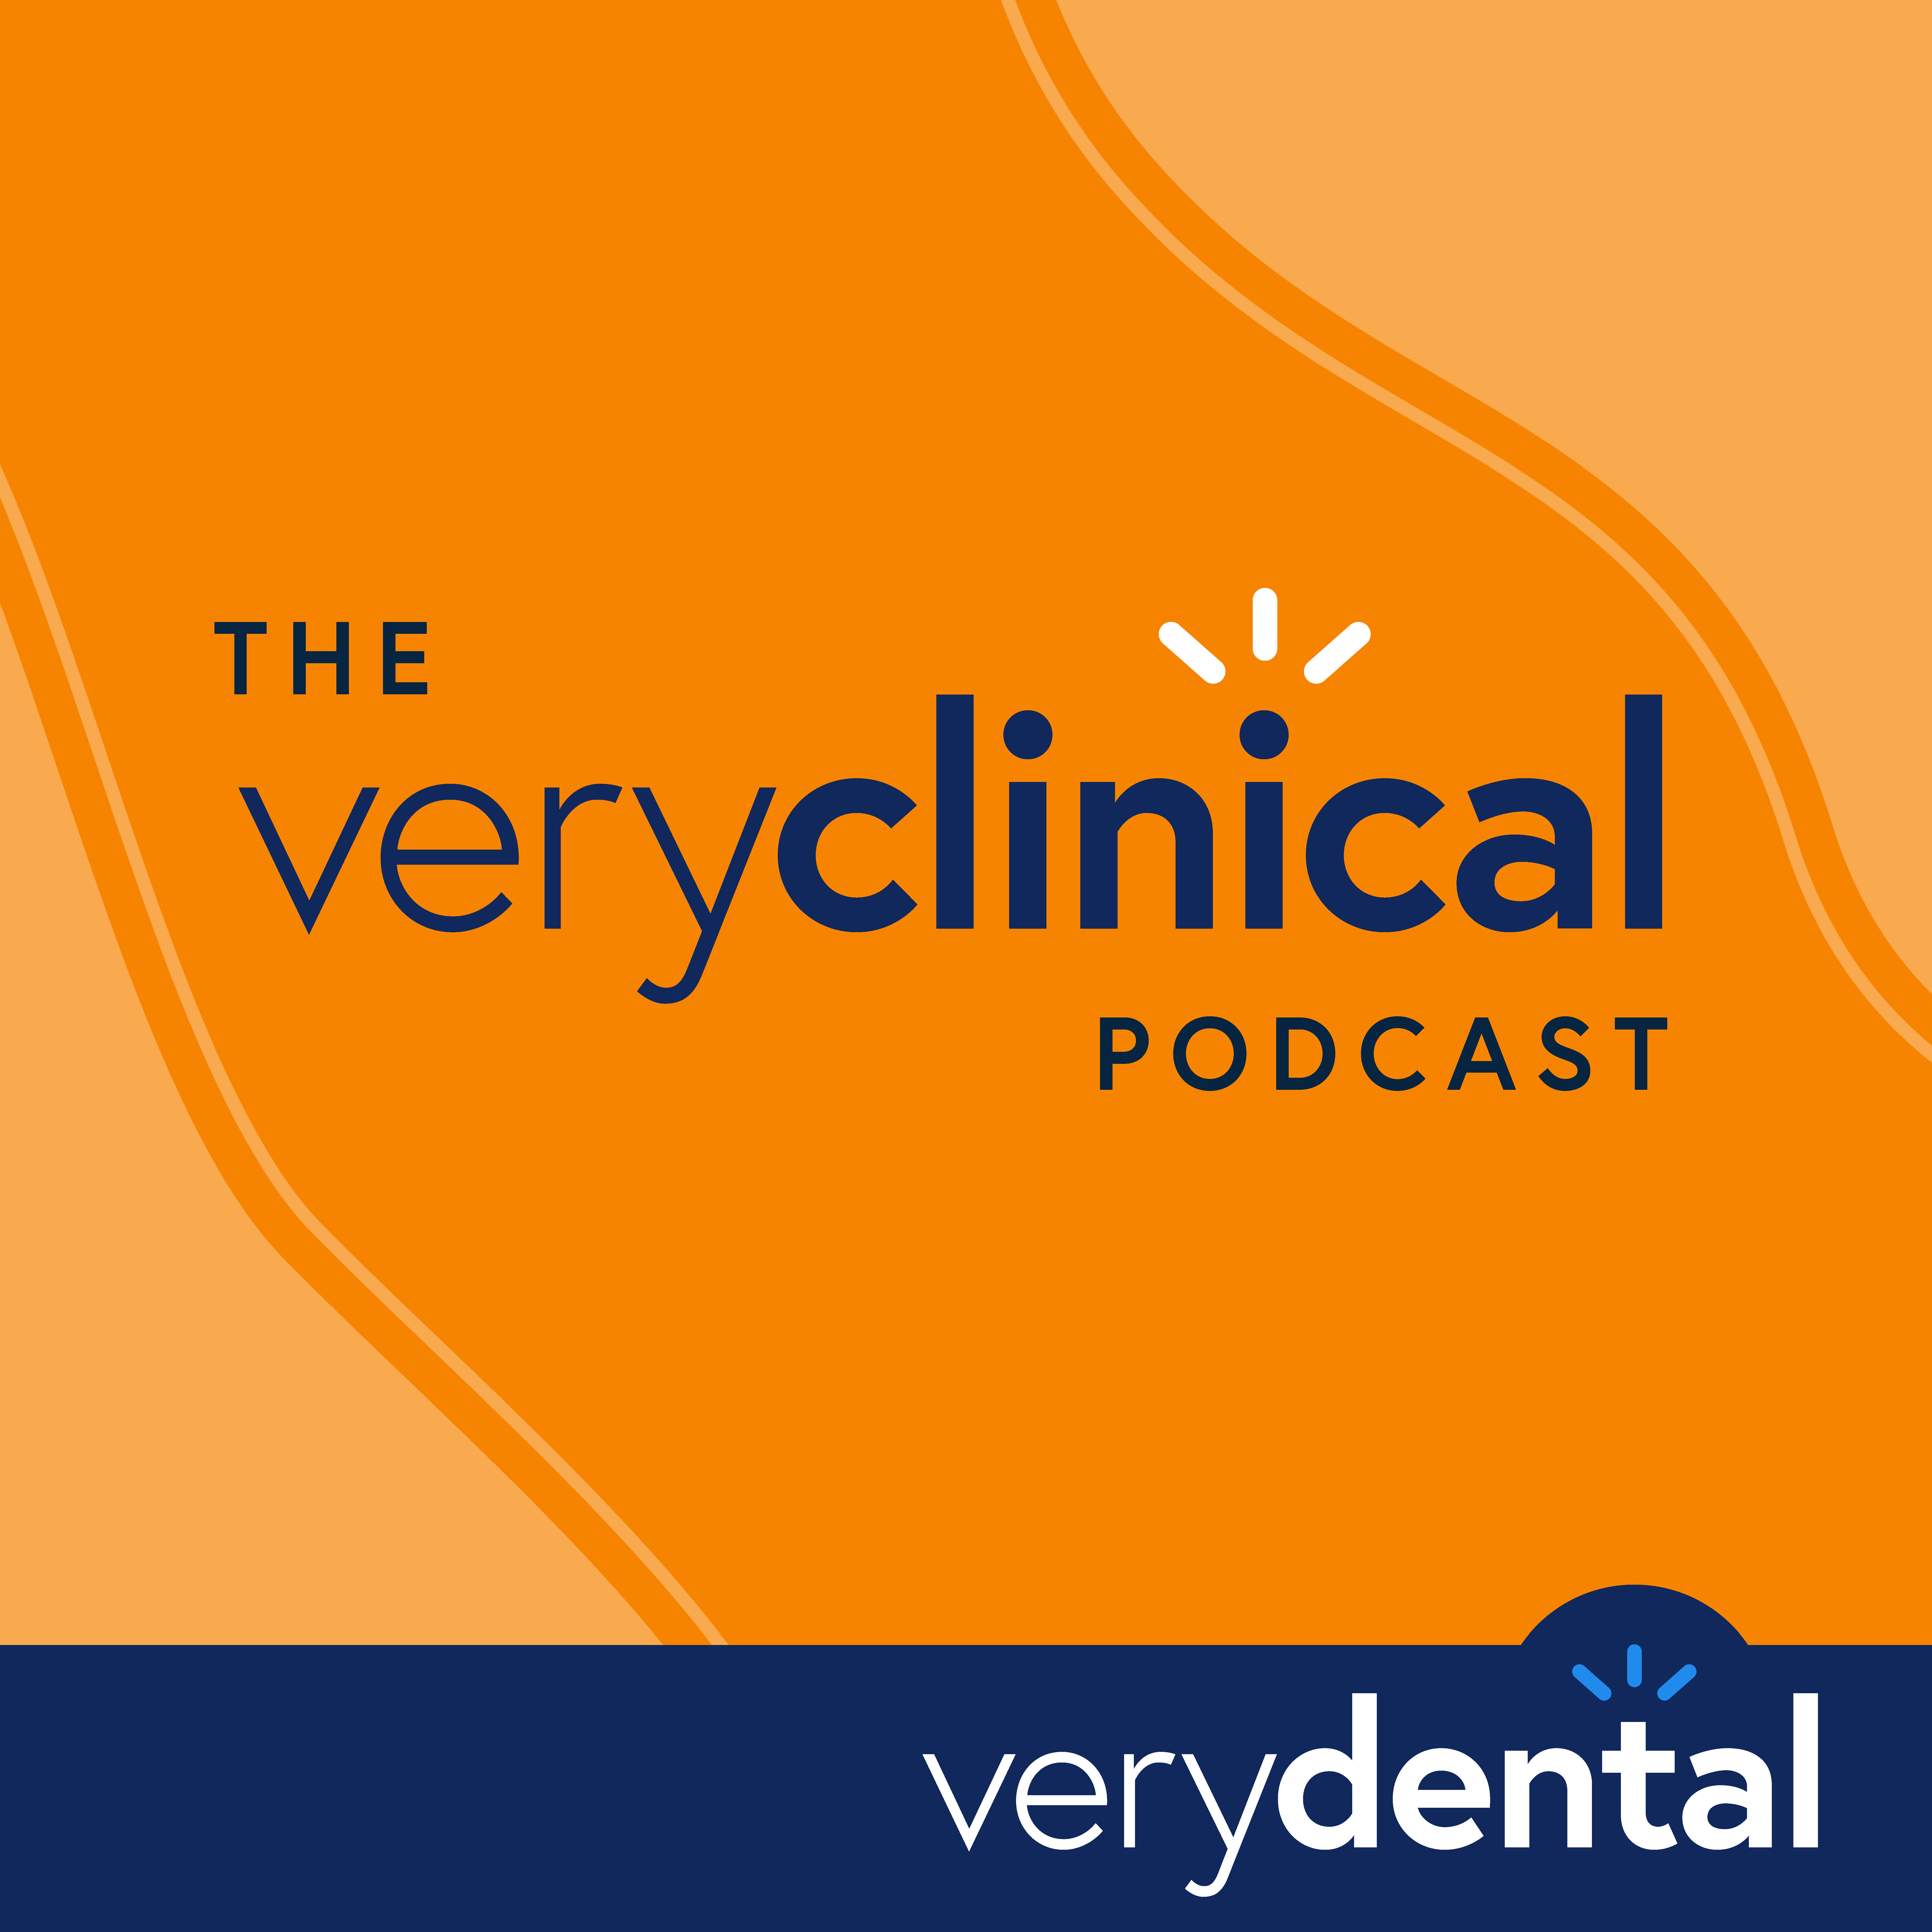 Very clinical podcast logo